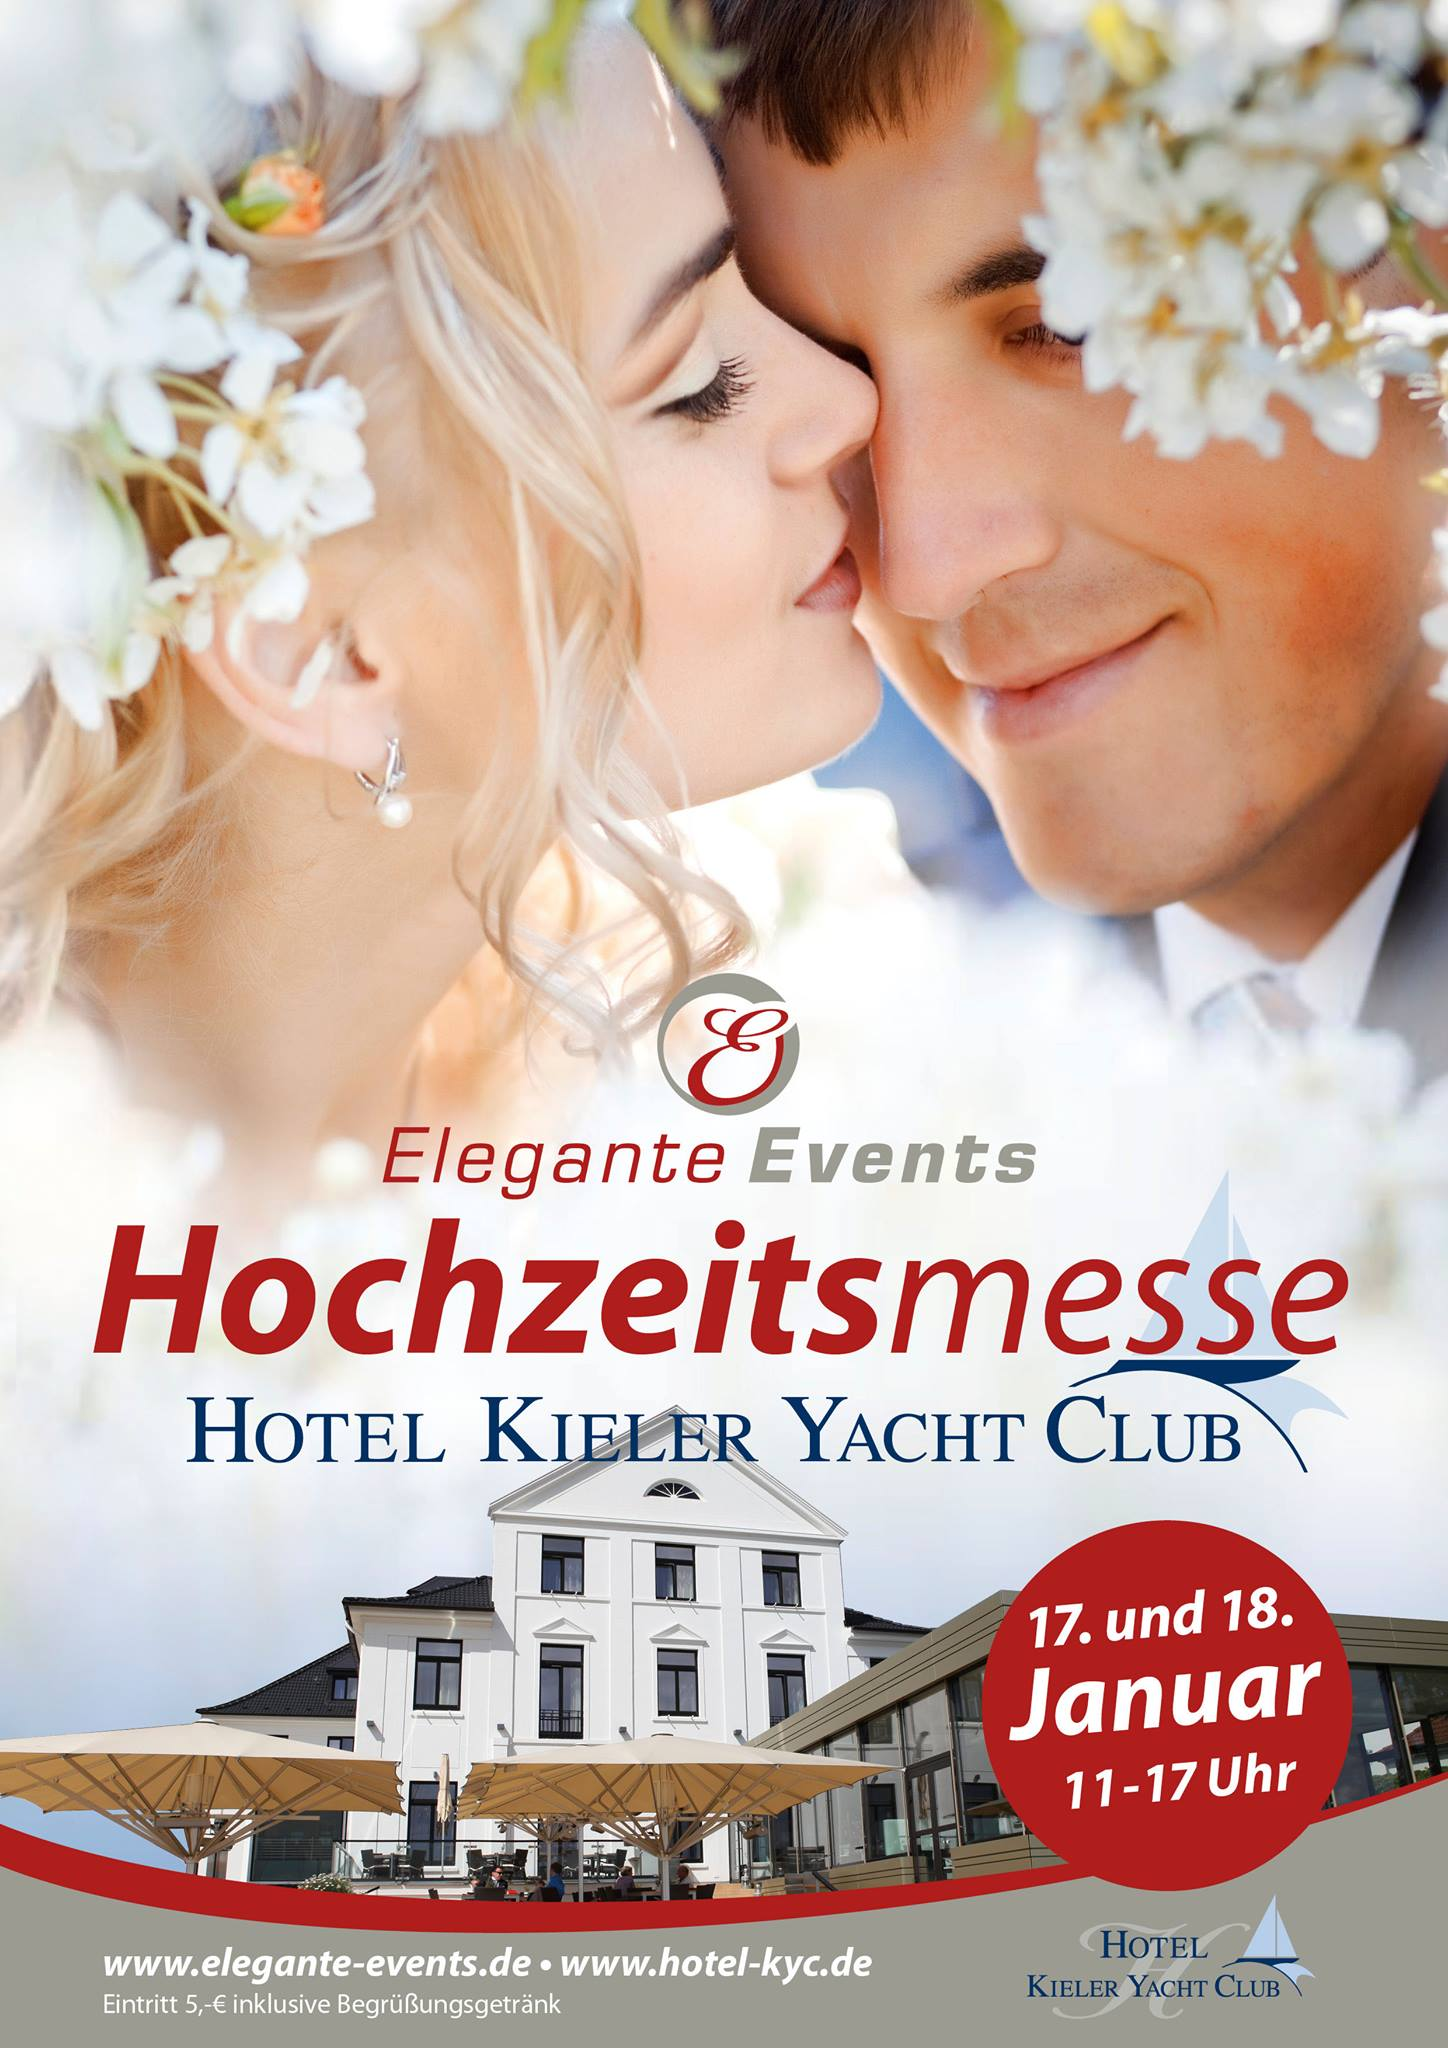 Hochzeitsmesse am 17. + 18. Januar 2015 im Kieler Yacht-Club - Hochzeitsfotograf Thomas Rohwedder • aadhoc-media.de